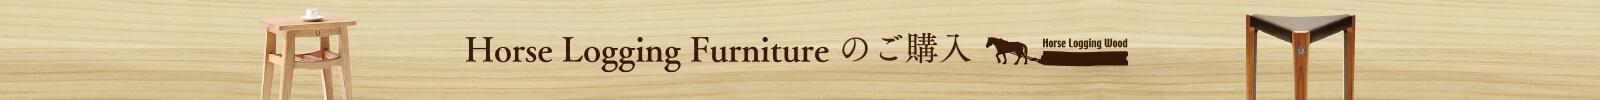 Horse Logging Furnitureのシリーズ紹介